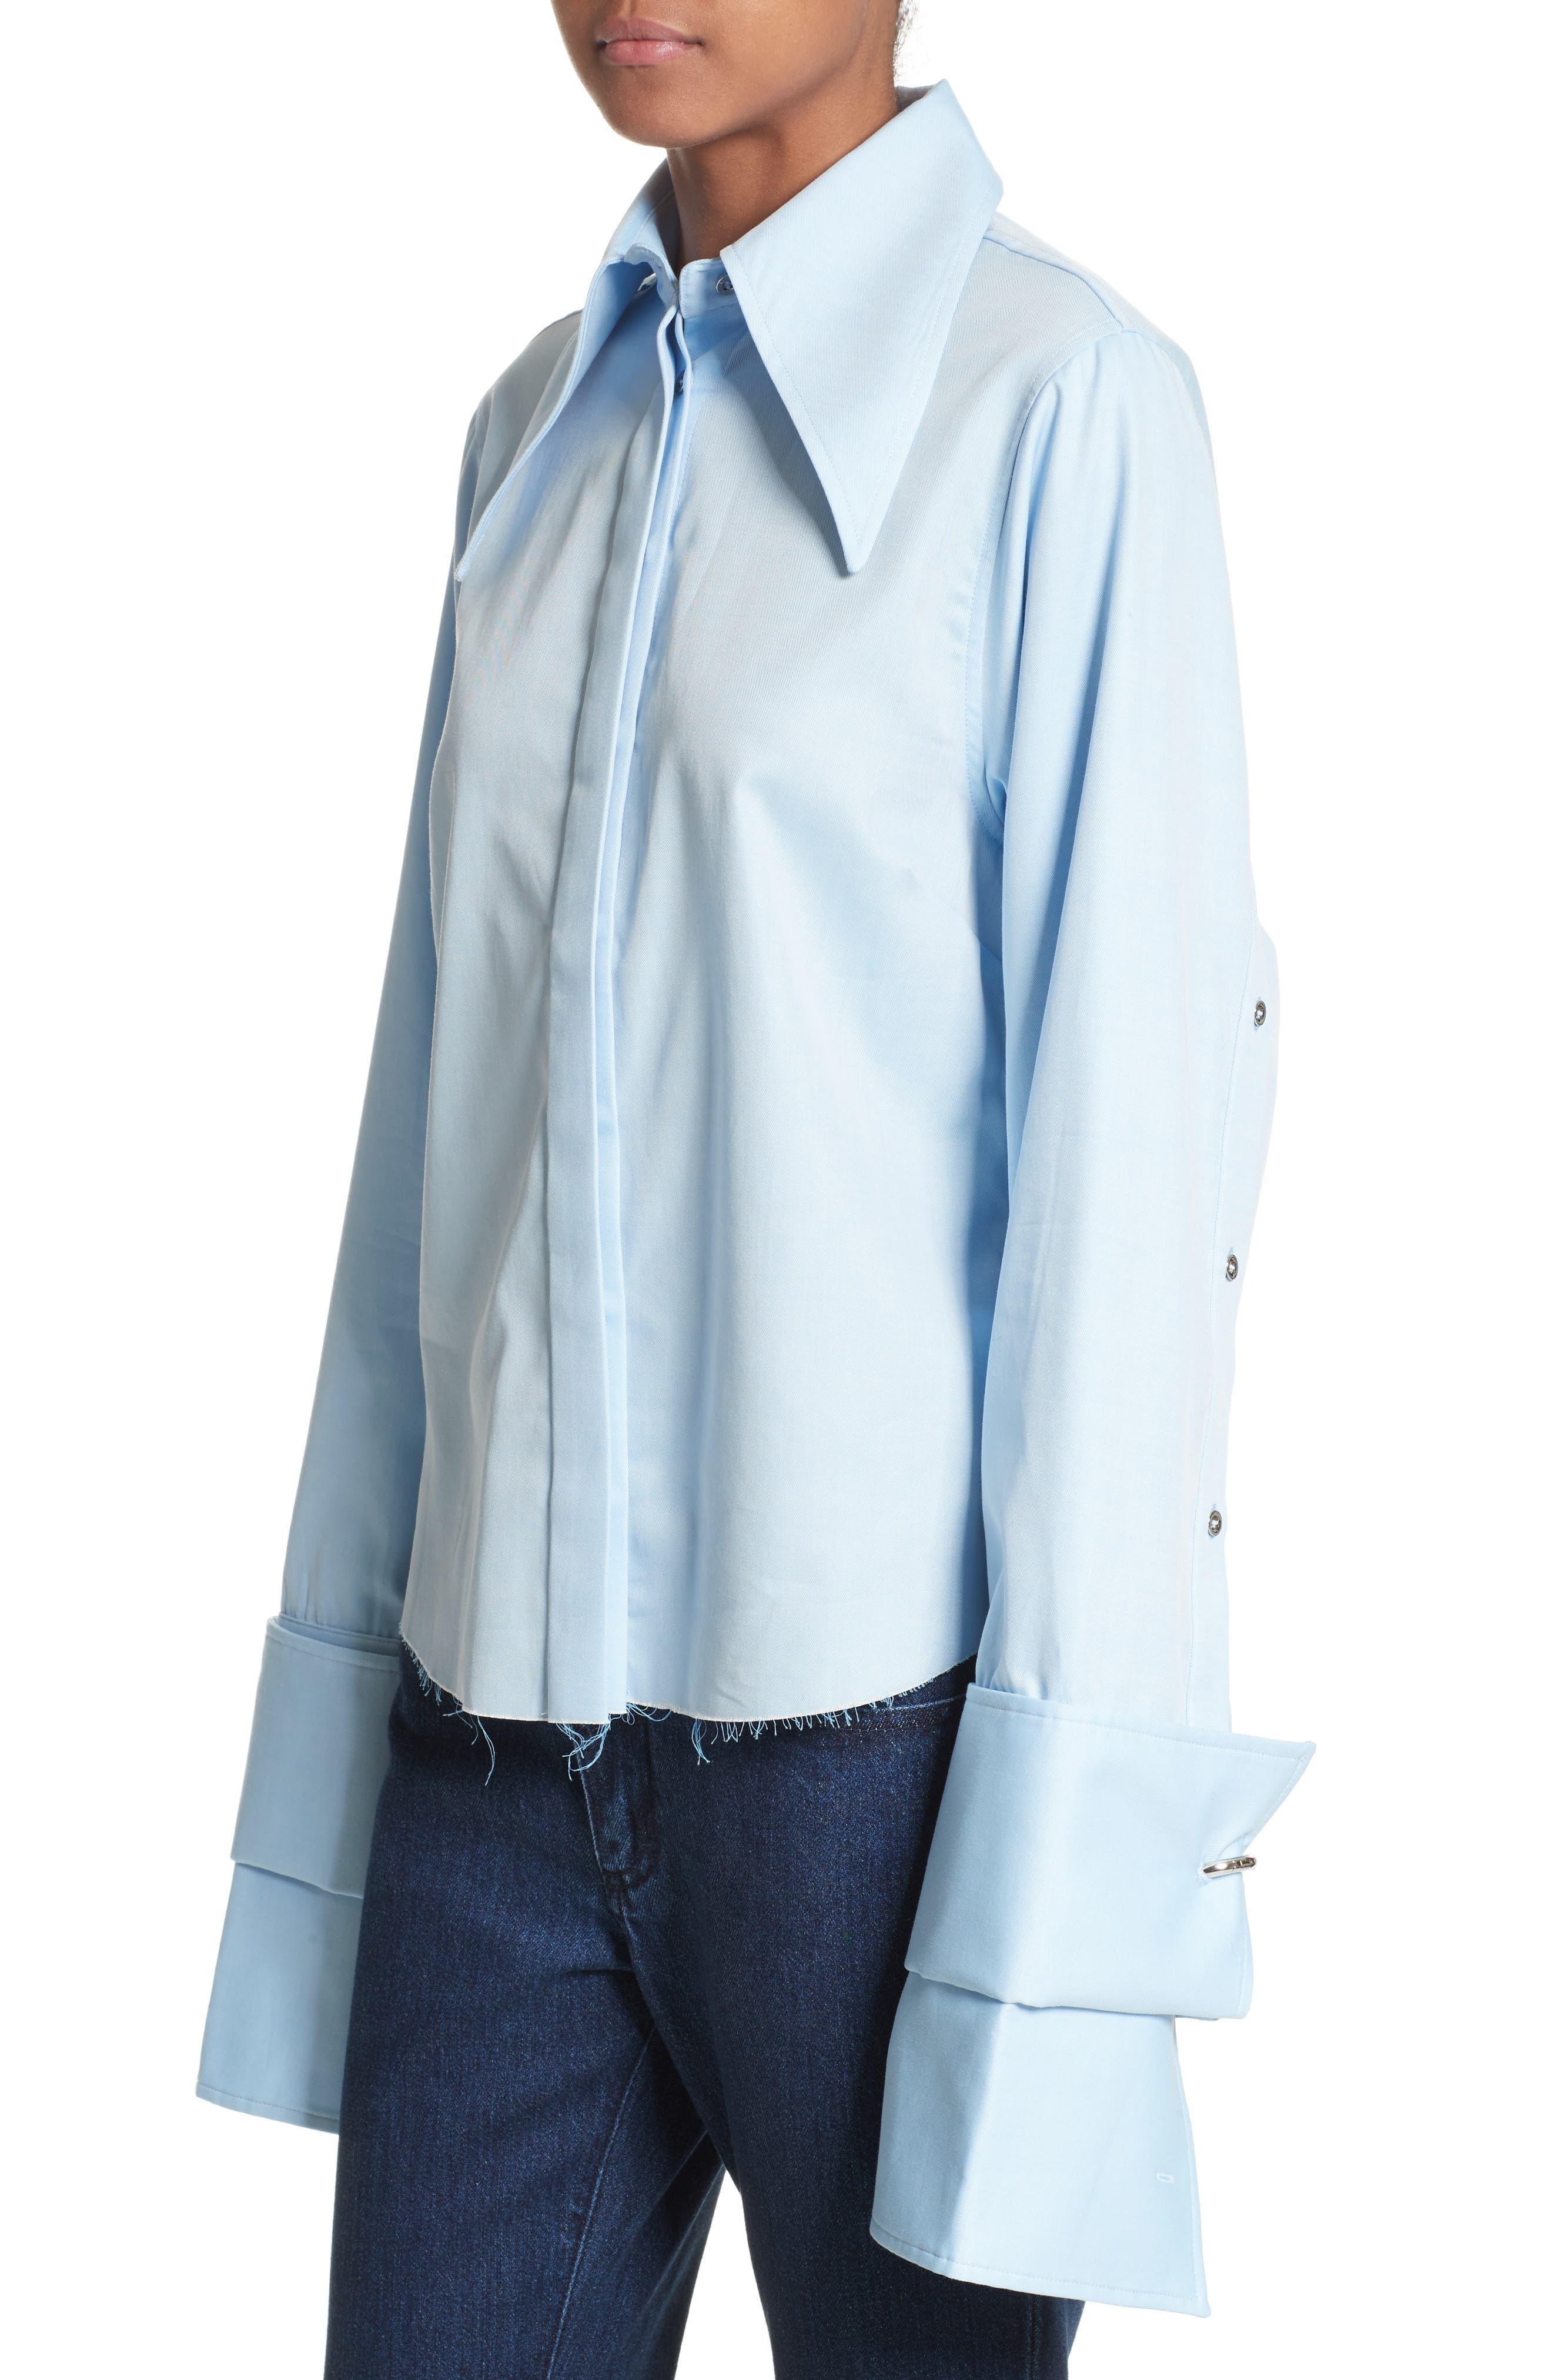 Marques'Almeida Double Sleeve Blouse,                             Alternate thumbnail 4, color,                             Light Blue